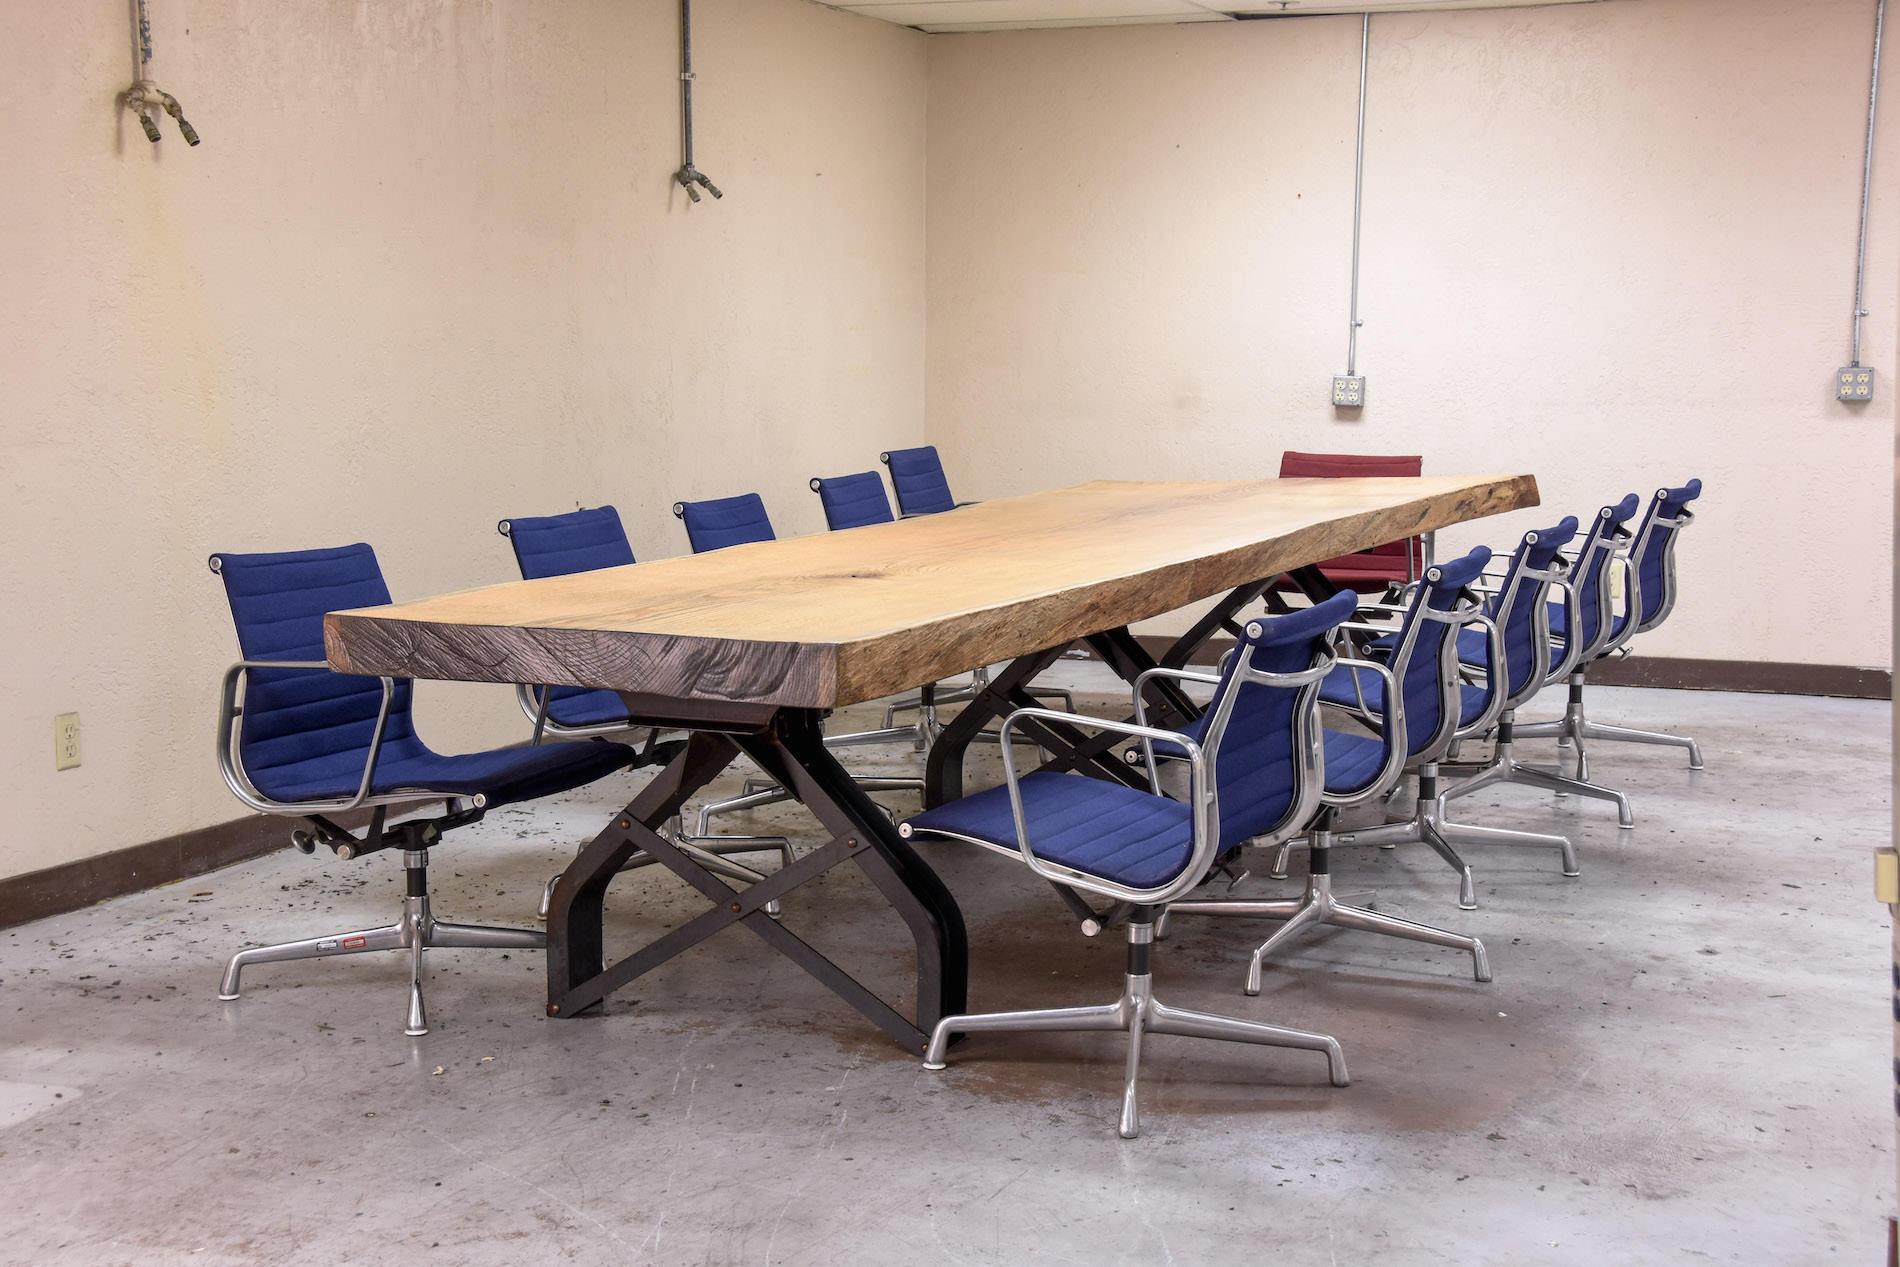 antique kitchen islands for sale jeffrey alexander island rouille live edge conference table   vintage industrial ...